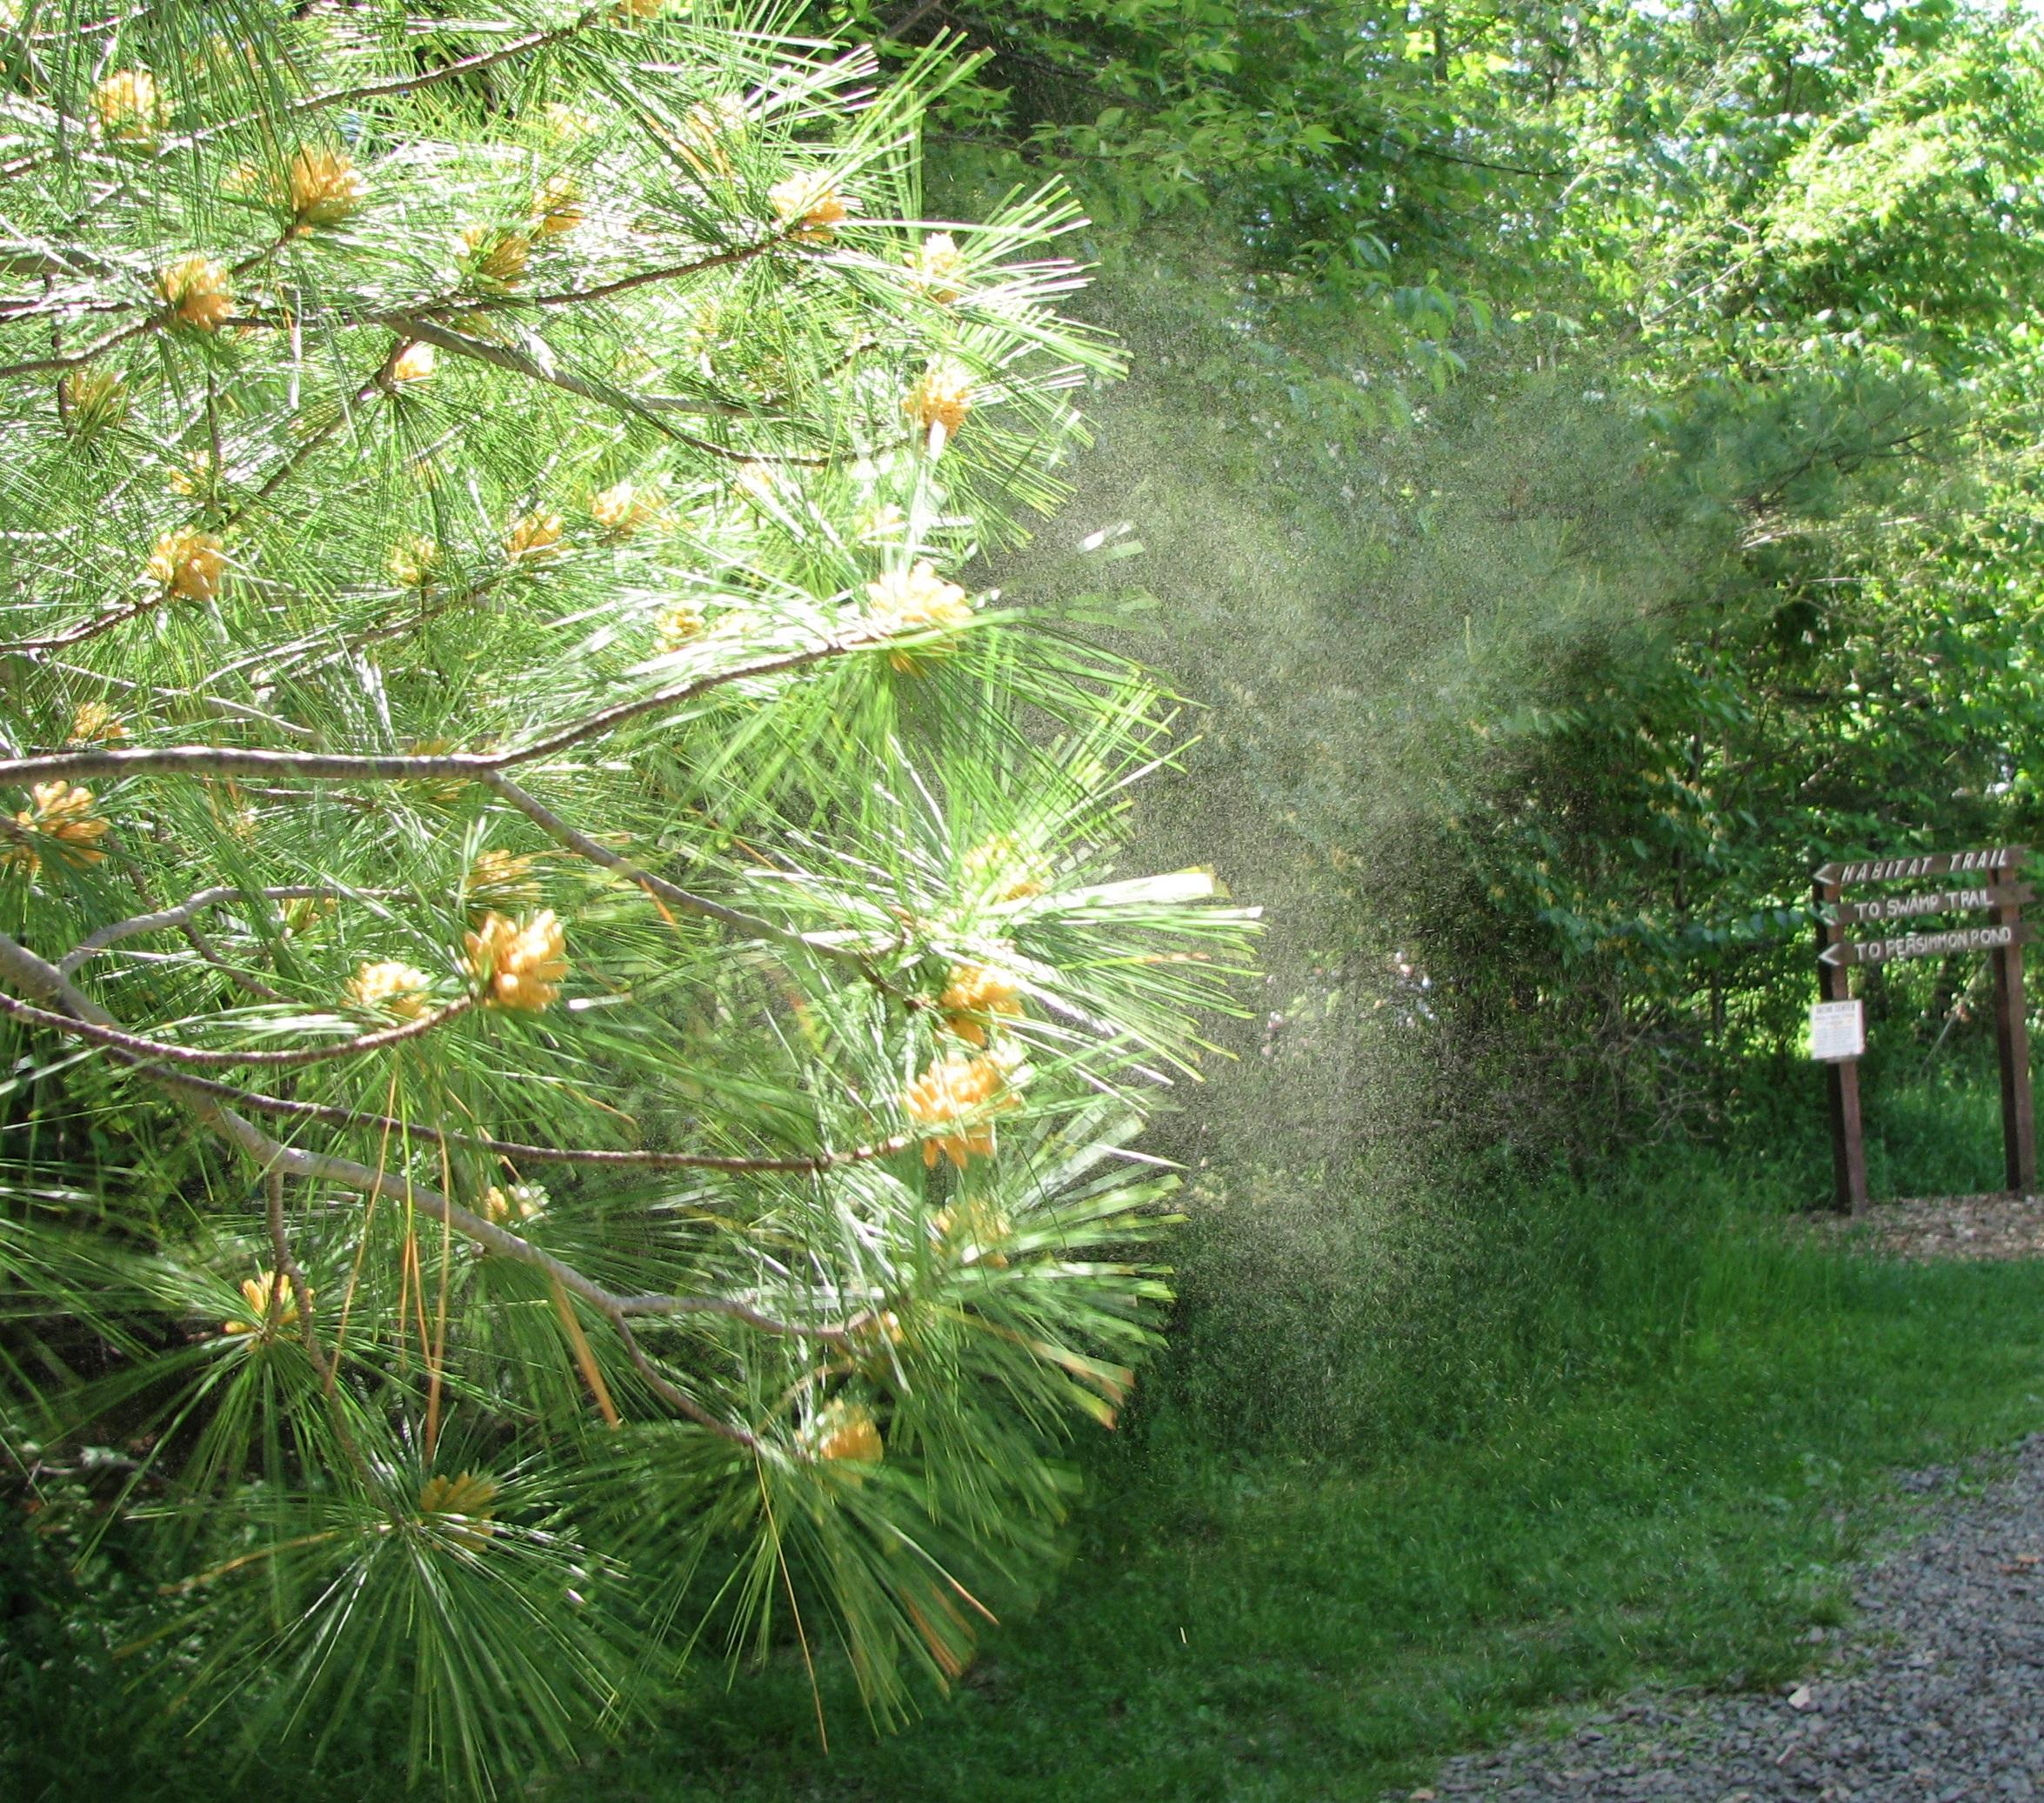 Pollination - Simple English Wikipedia, the free encyclopedia